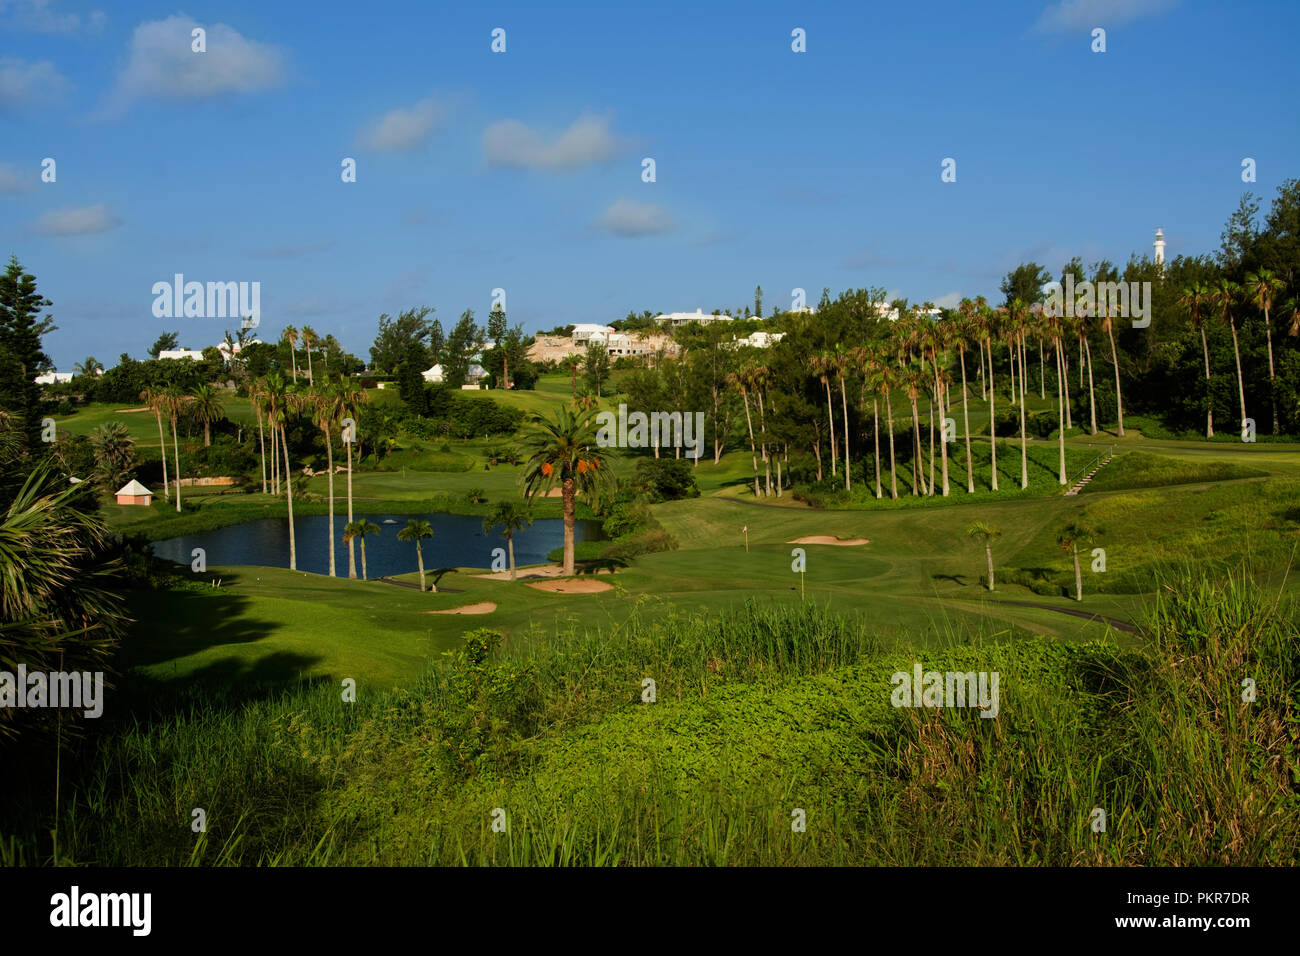 Atlantic Ocean, Bermuda, Southampton Parish, Fairmont Hotel golf course - Stock Image